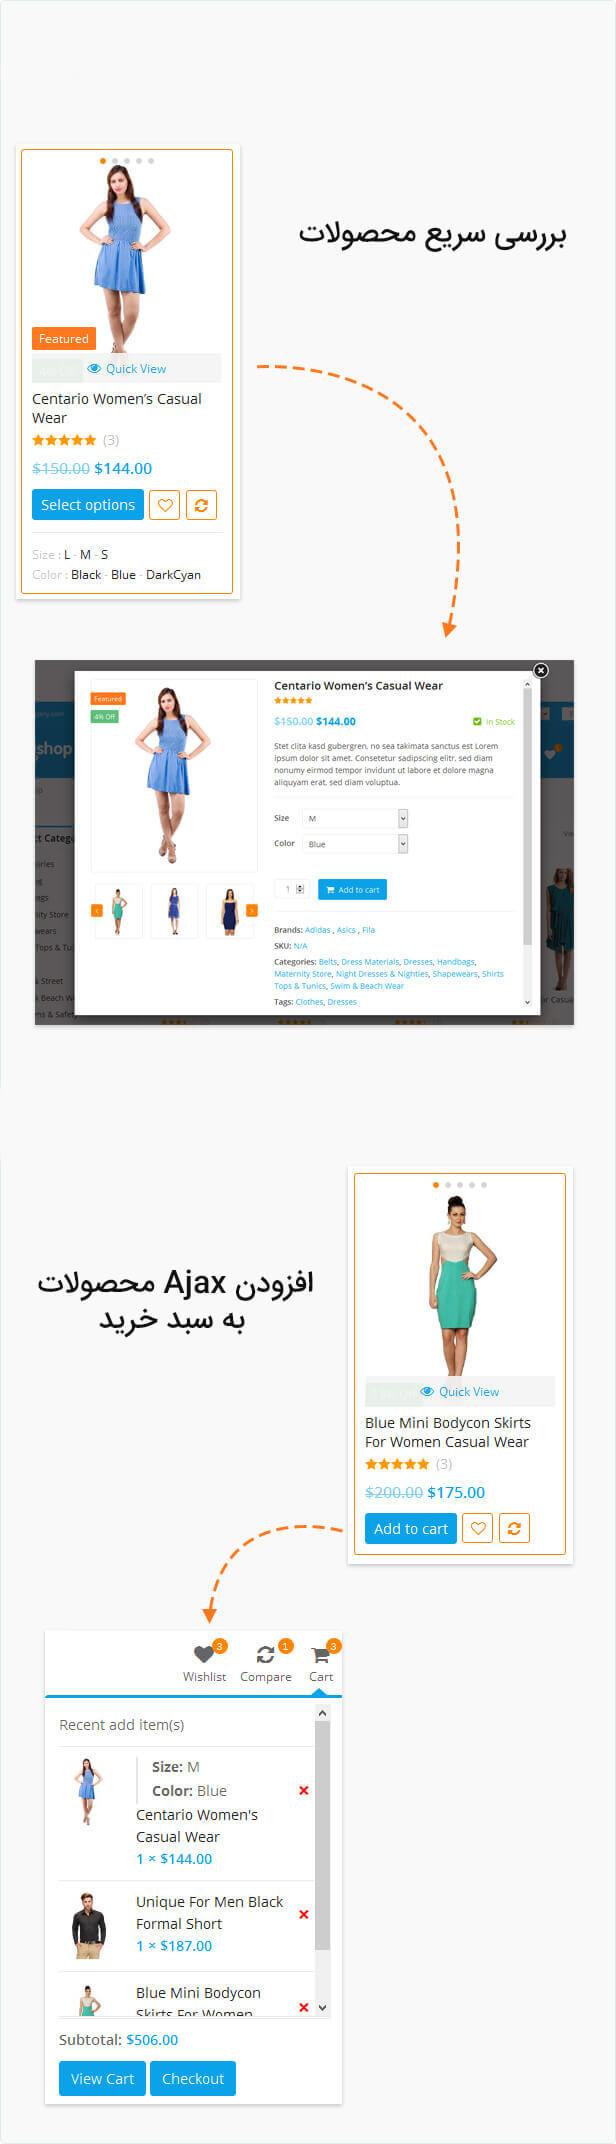 قالب وردپرس فروشگاهی امال شاپ emallShop